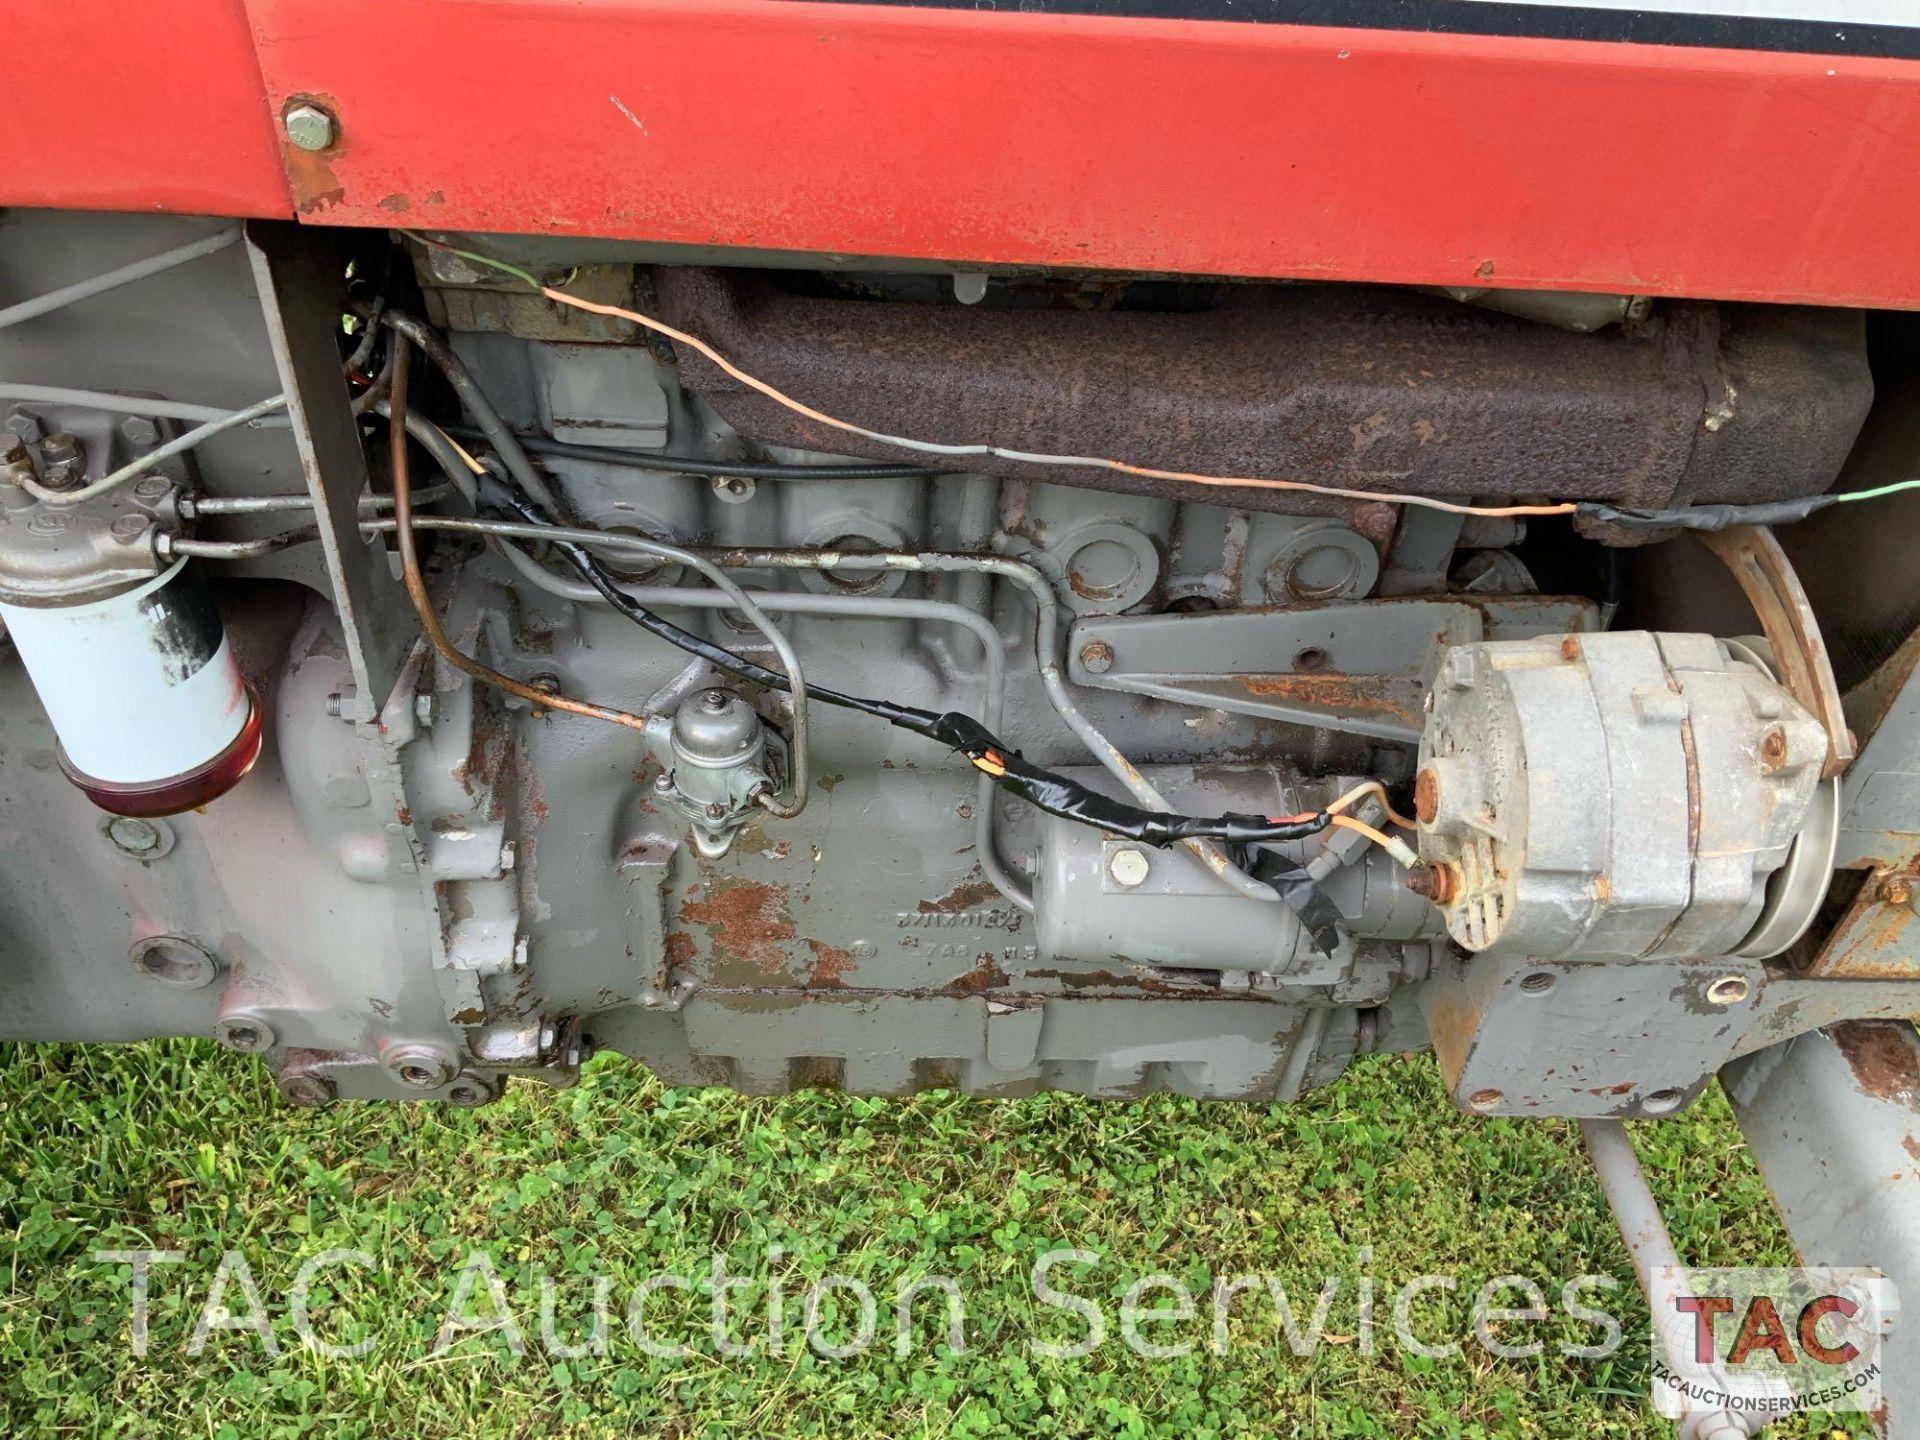 Massey Ferguson 275 Farm Tractor - Image 18 of 25